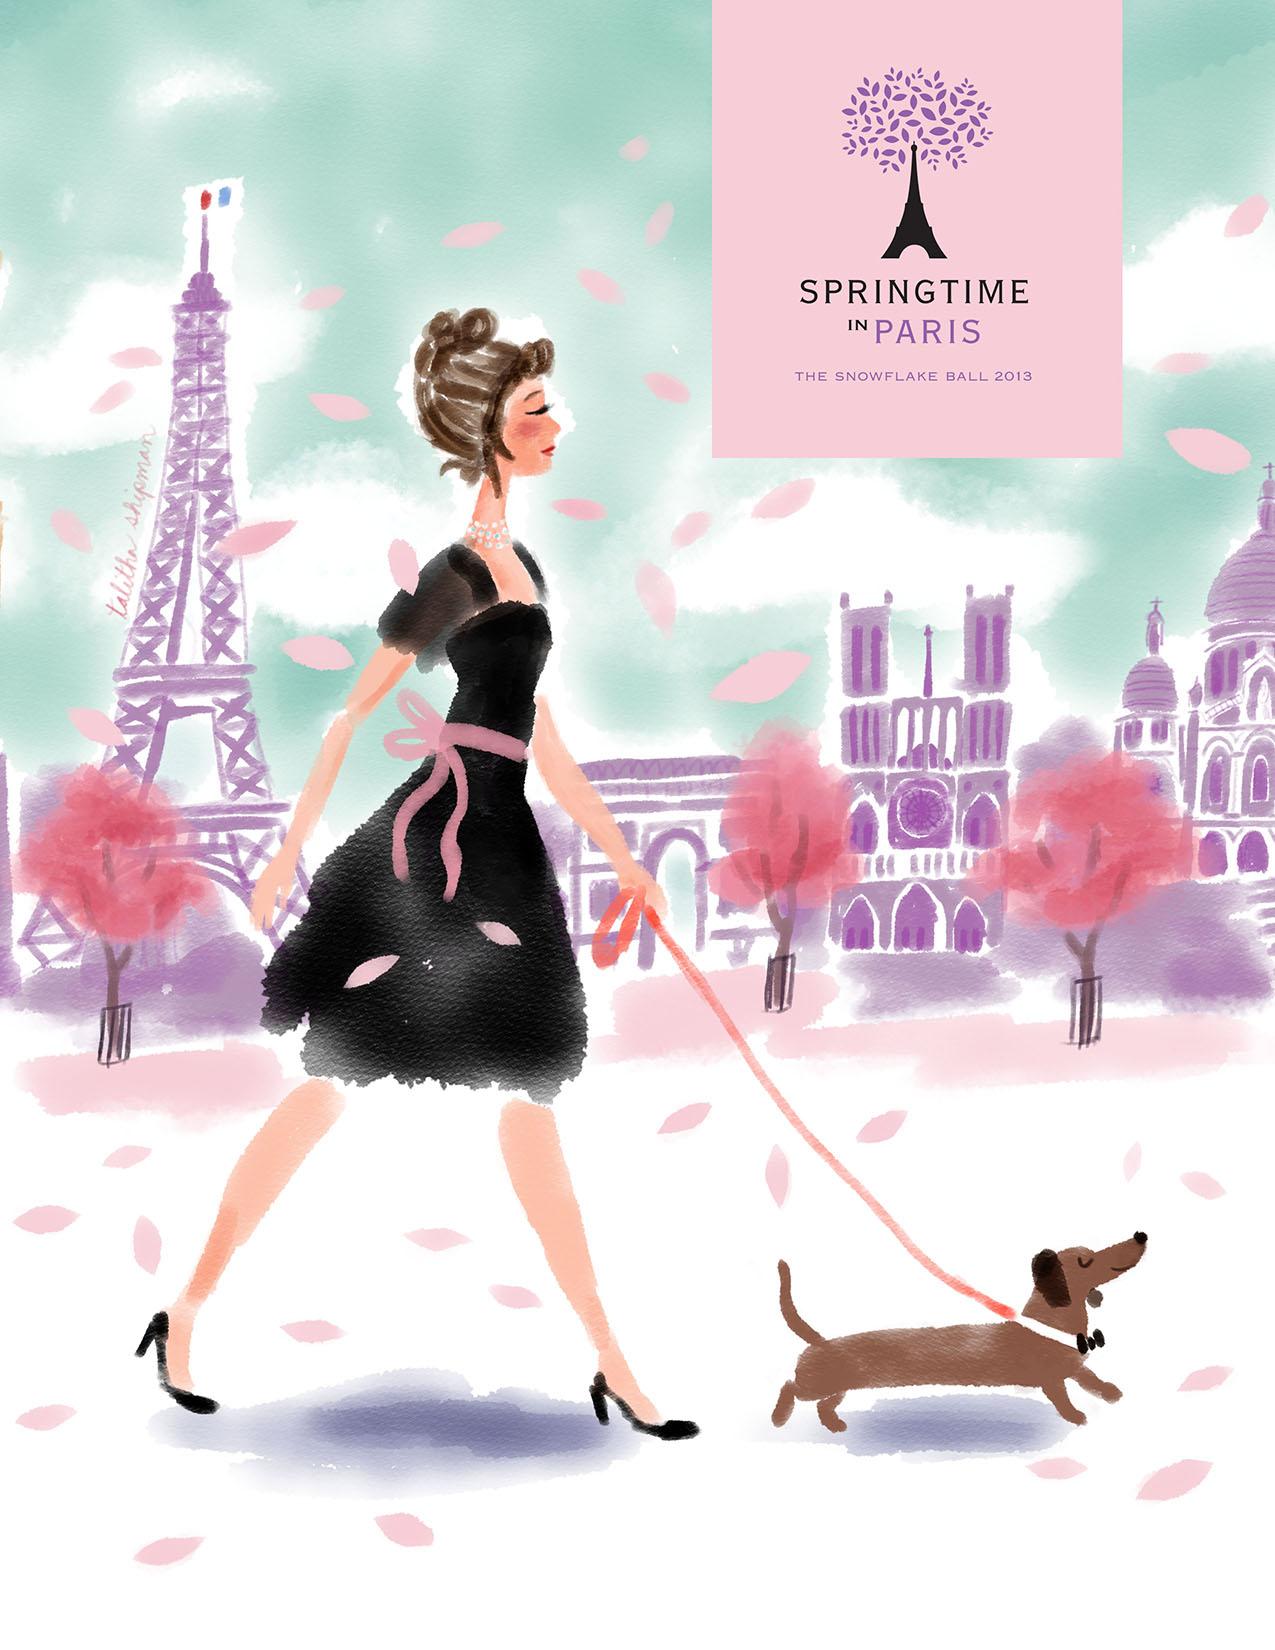 Springtime In Paris Program Cover